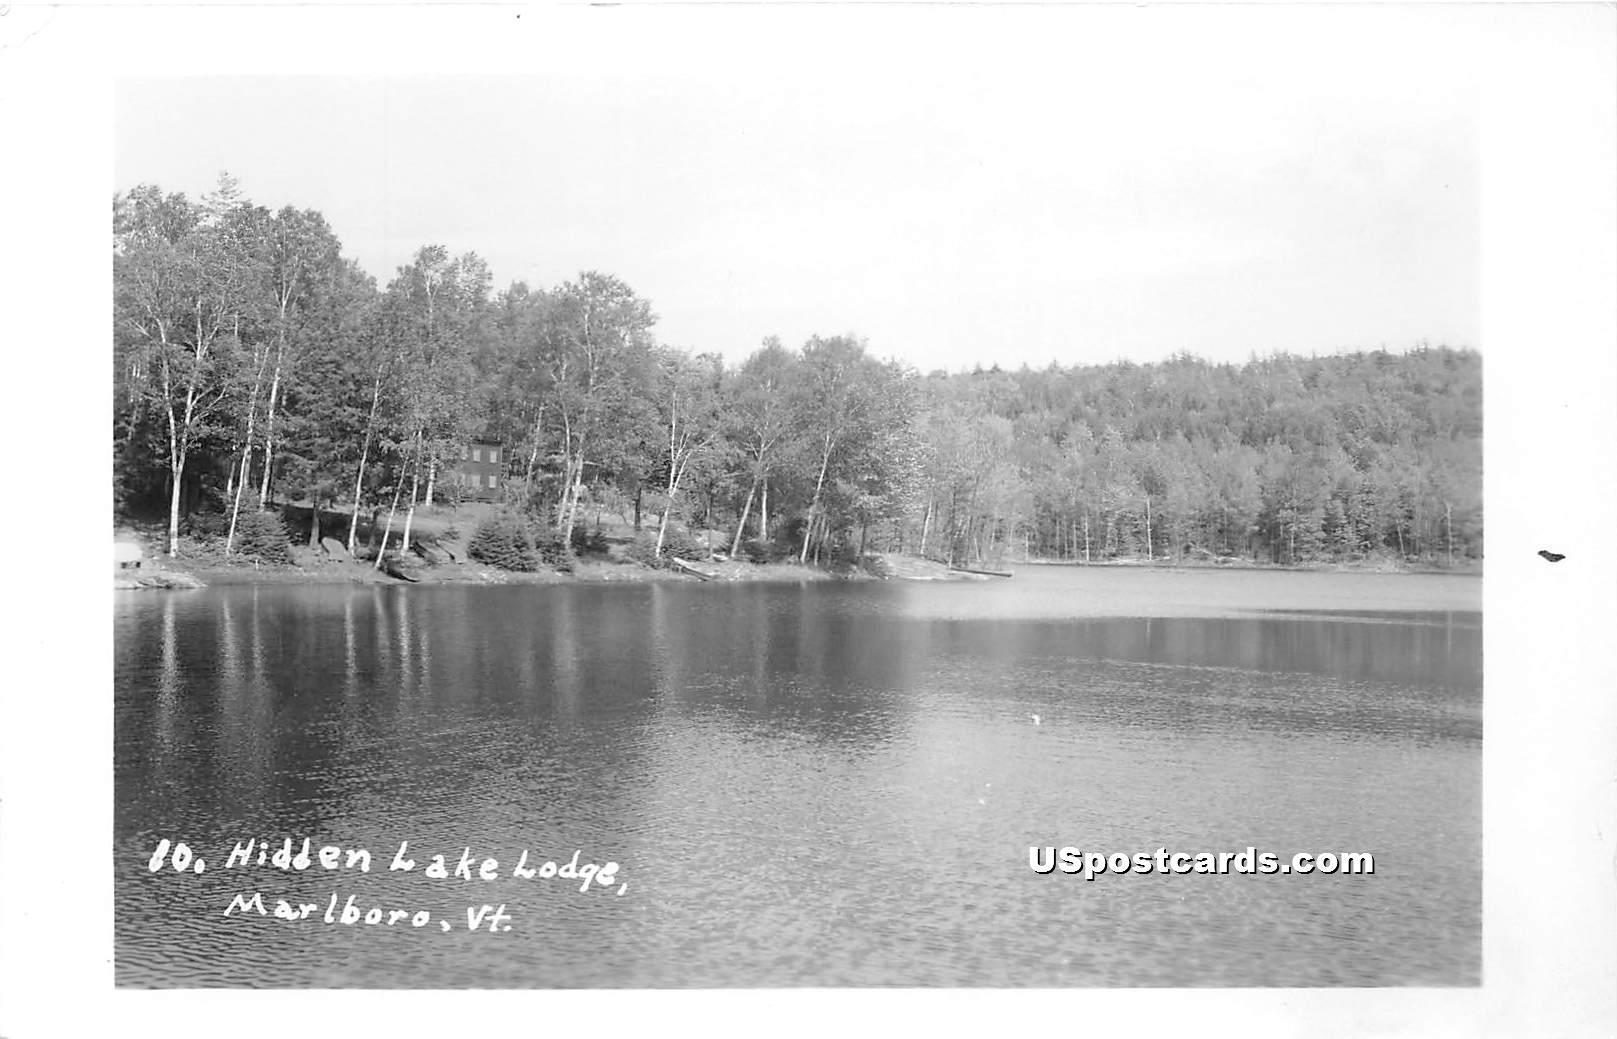 Hidden Lake Lodge - Marlboro, Vermont VT Postcard